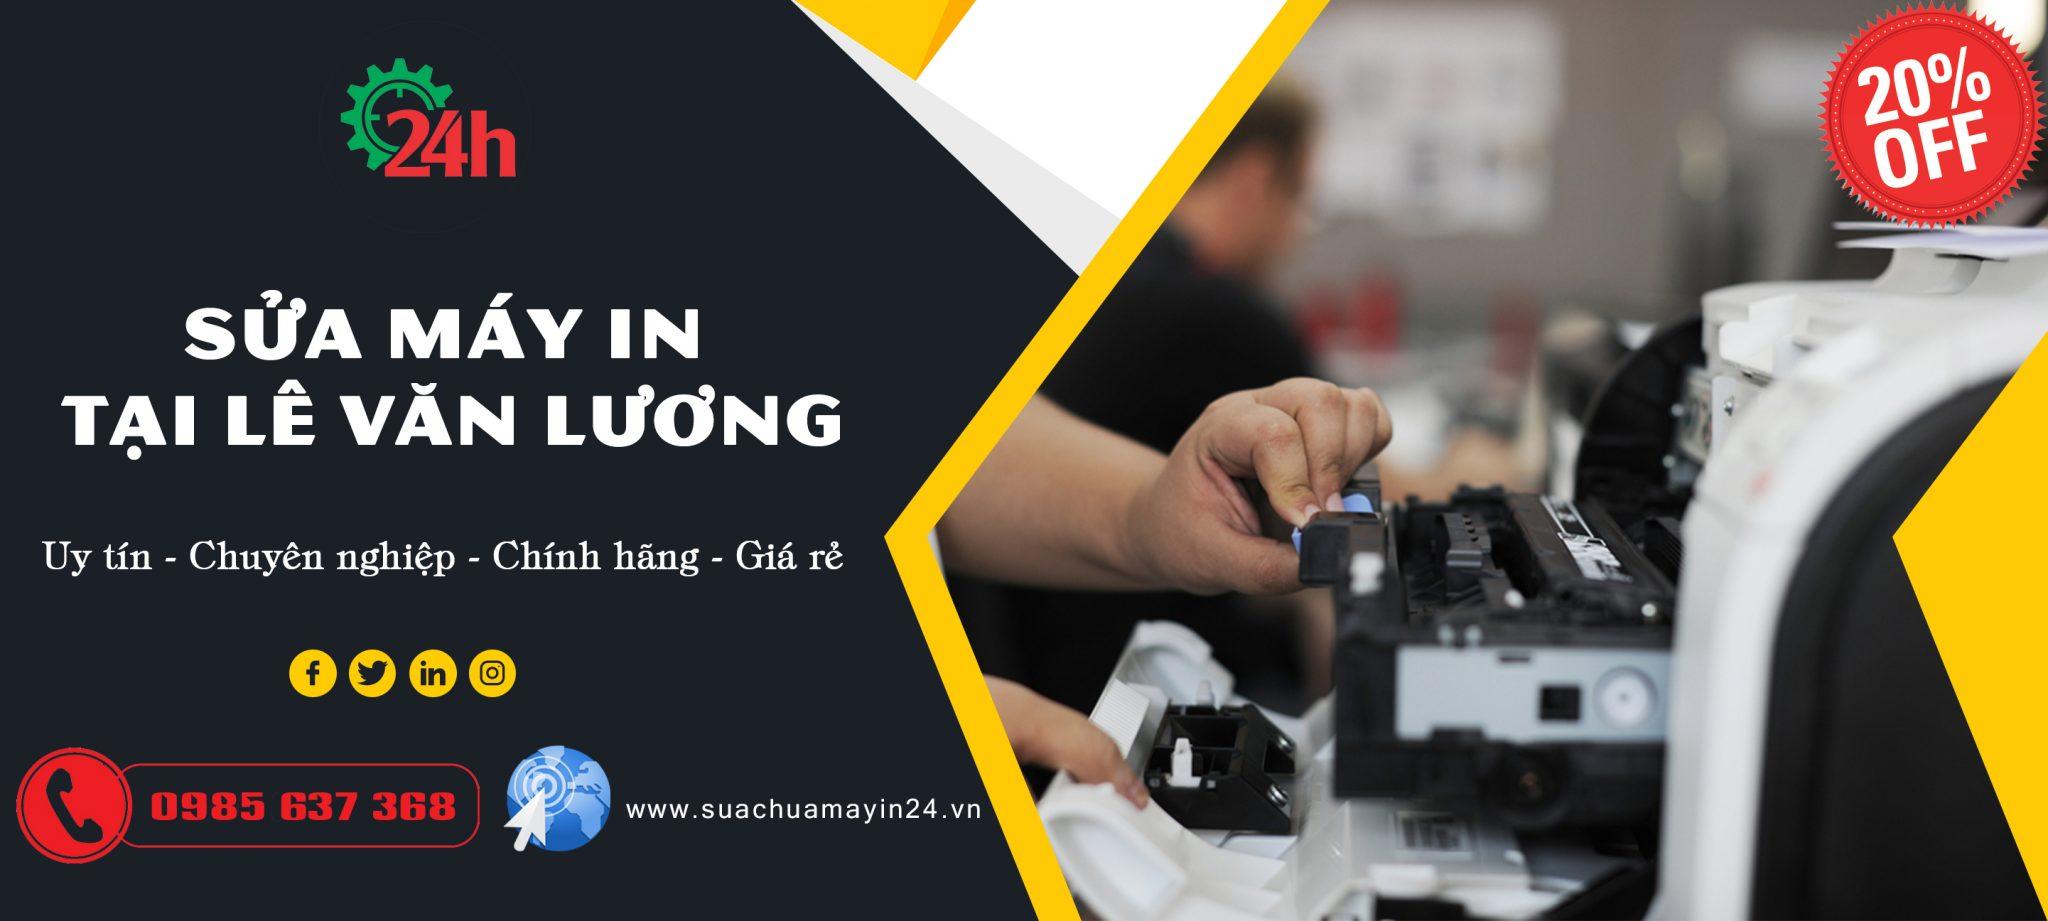 sua-may-in-tai-le-van-luong